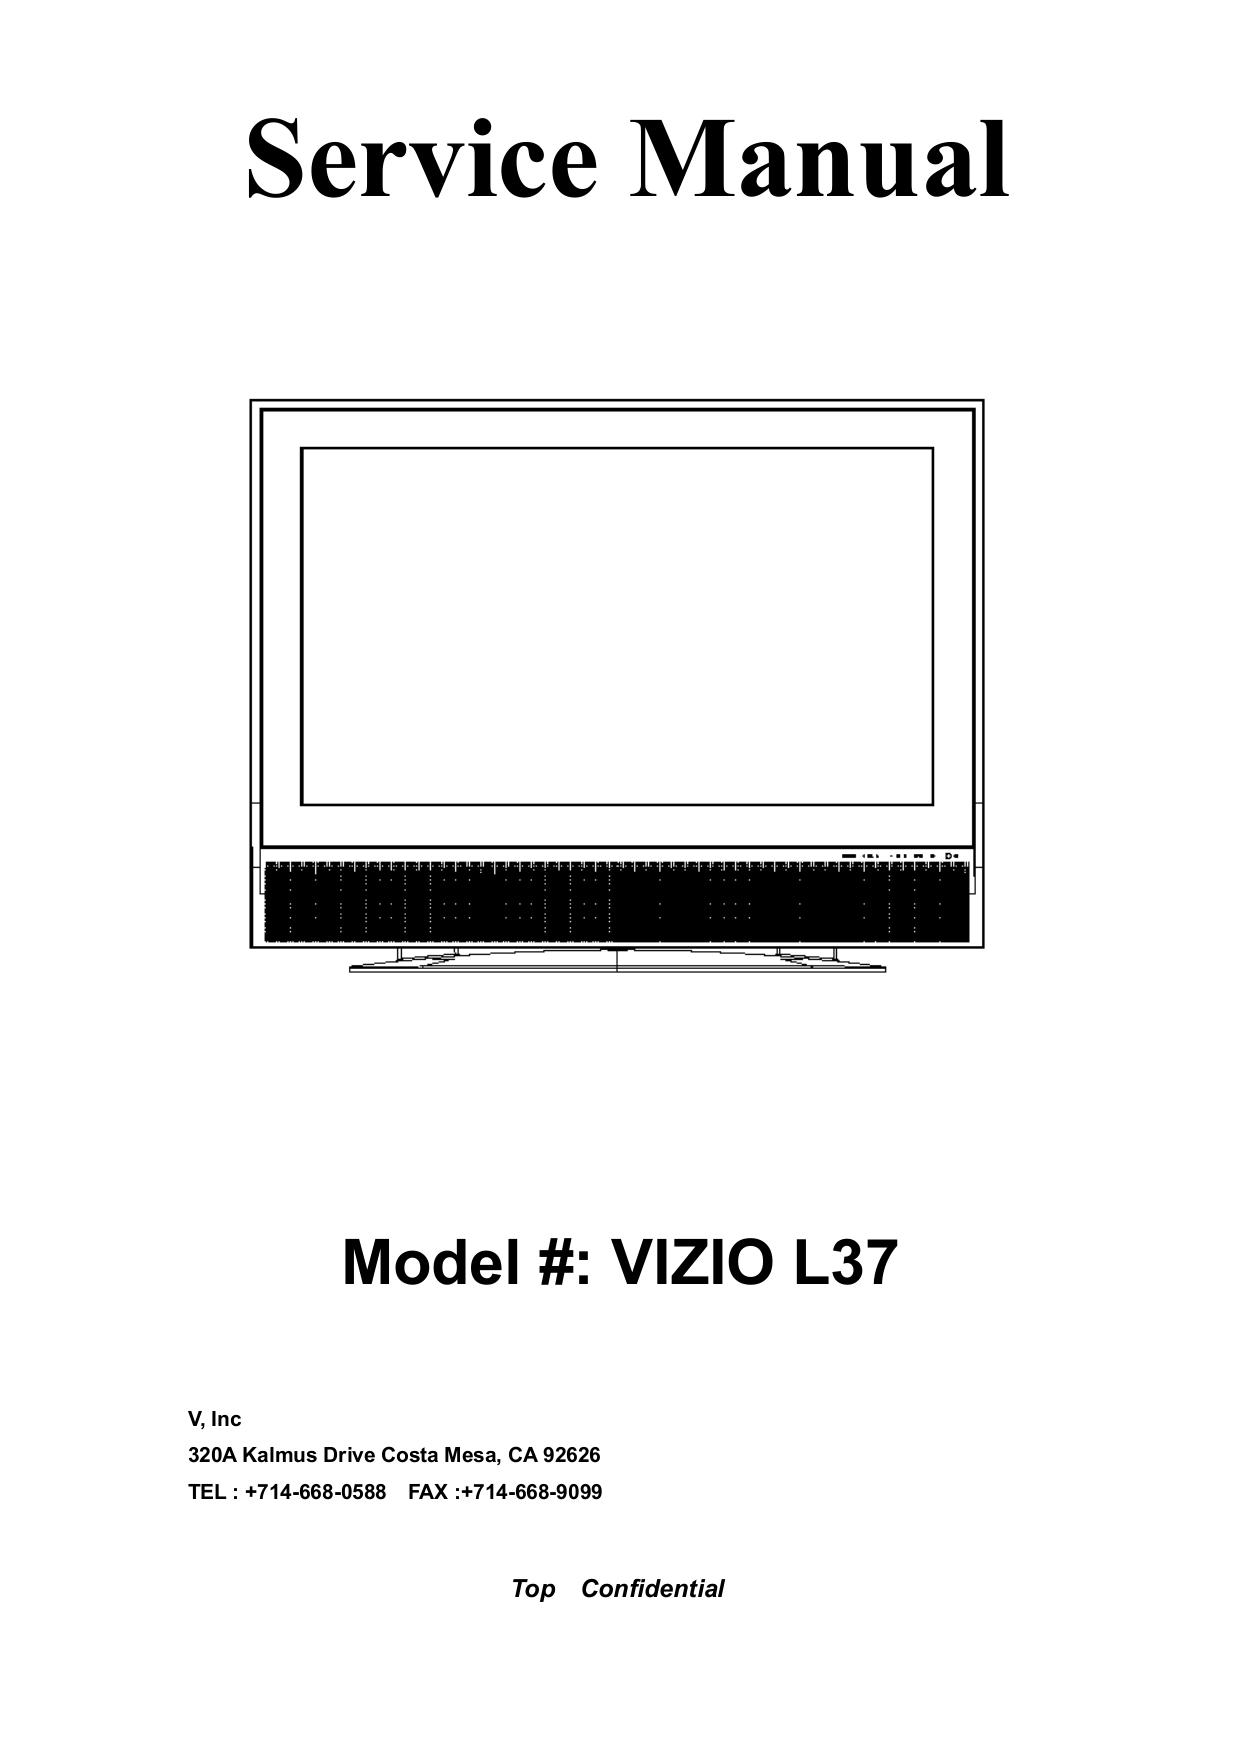 download free pdf for vizio vx37l tv manual rh umlib com Wall Mount Vizio VX37L Vizio VX37L 37 LCD HDTV